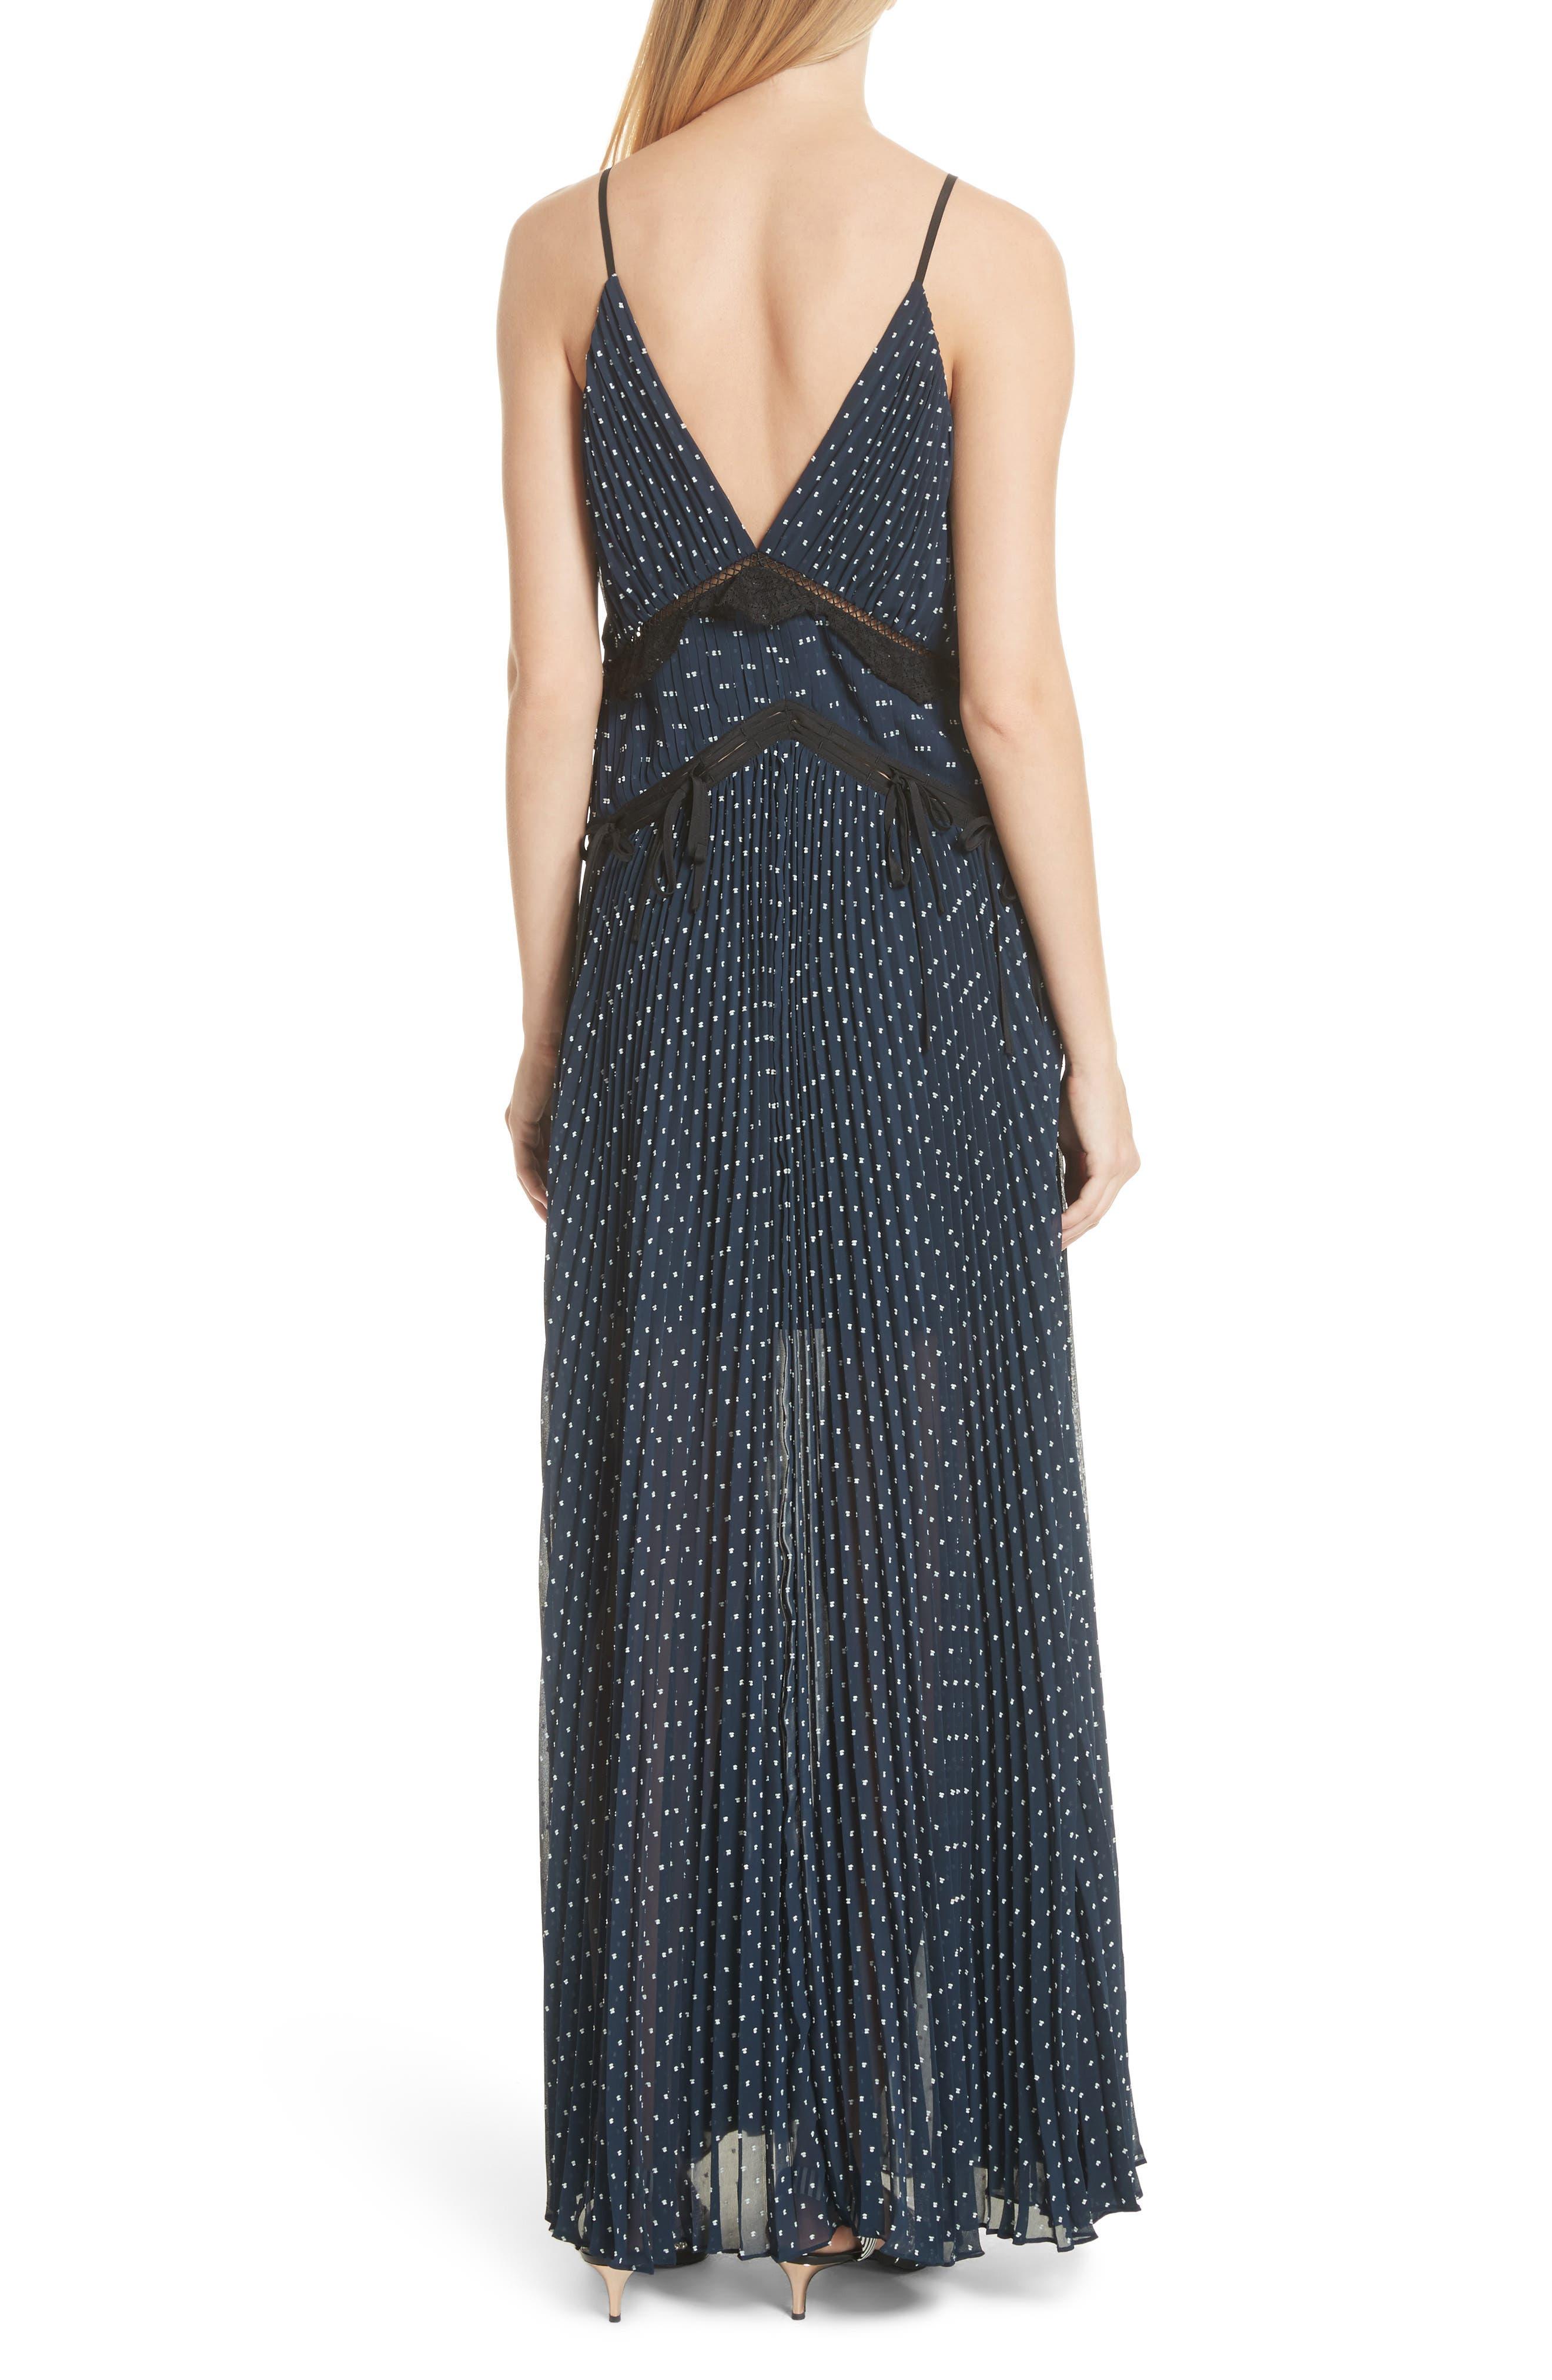 Plumetis Maxi Dress,                             Alternate thumbnail 2, color,                             Navy